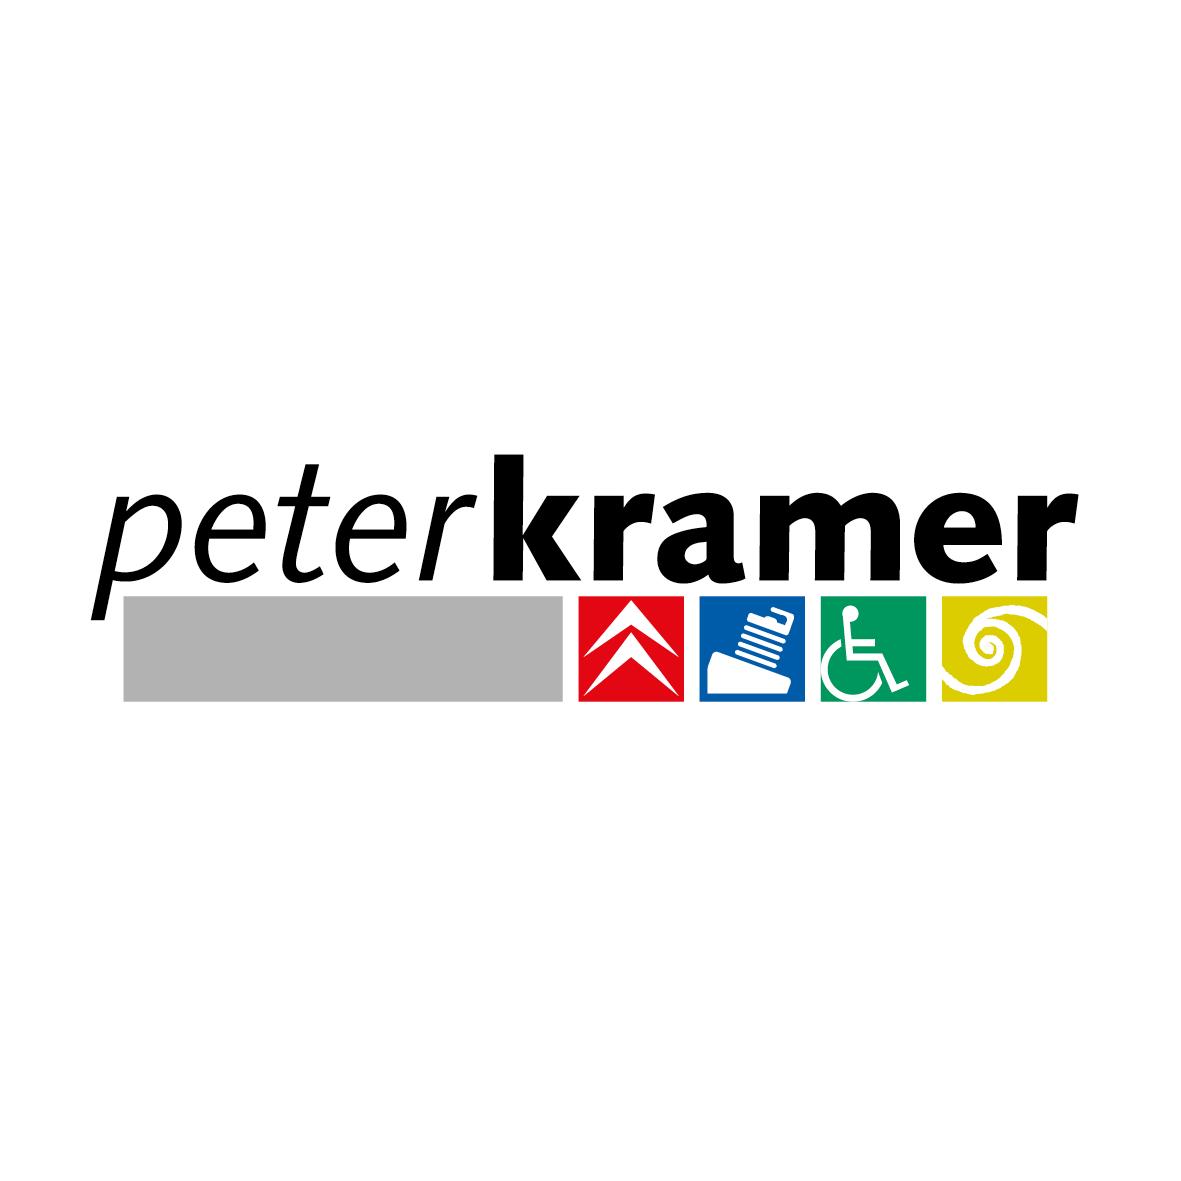 Peter Kramer Logo Agentur Hildesheim